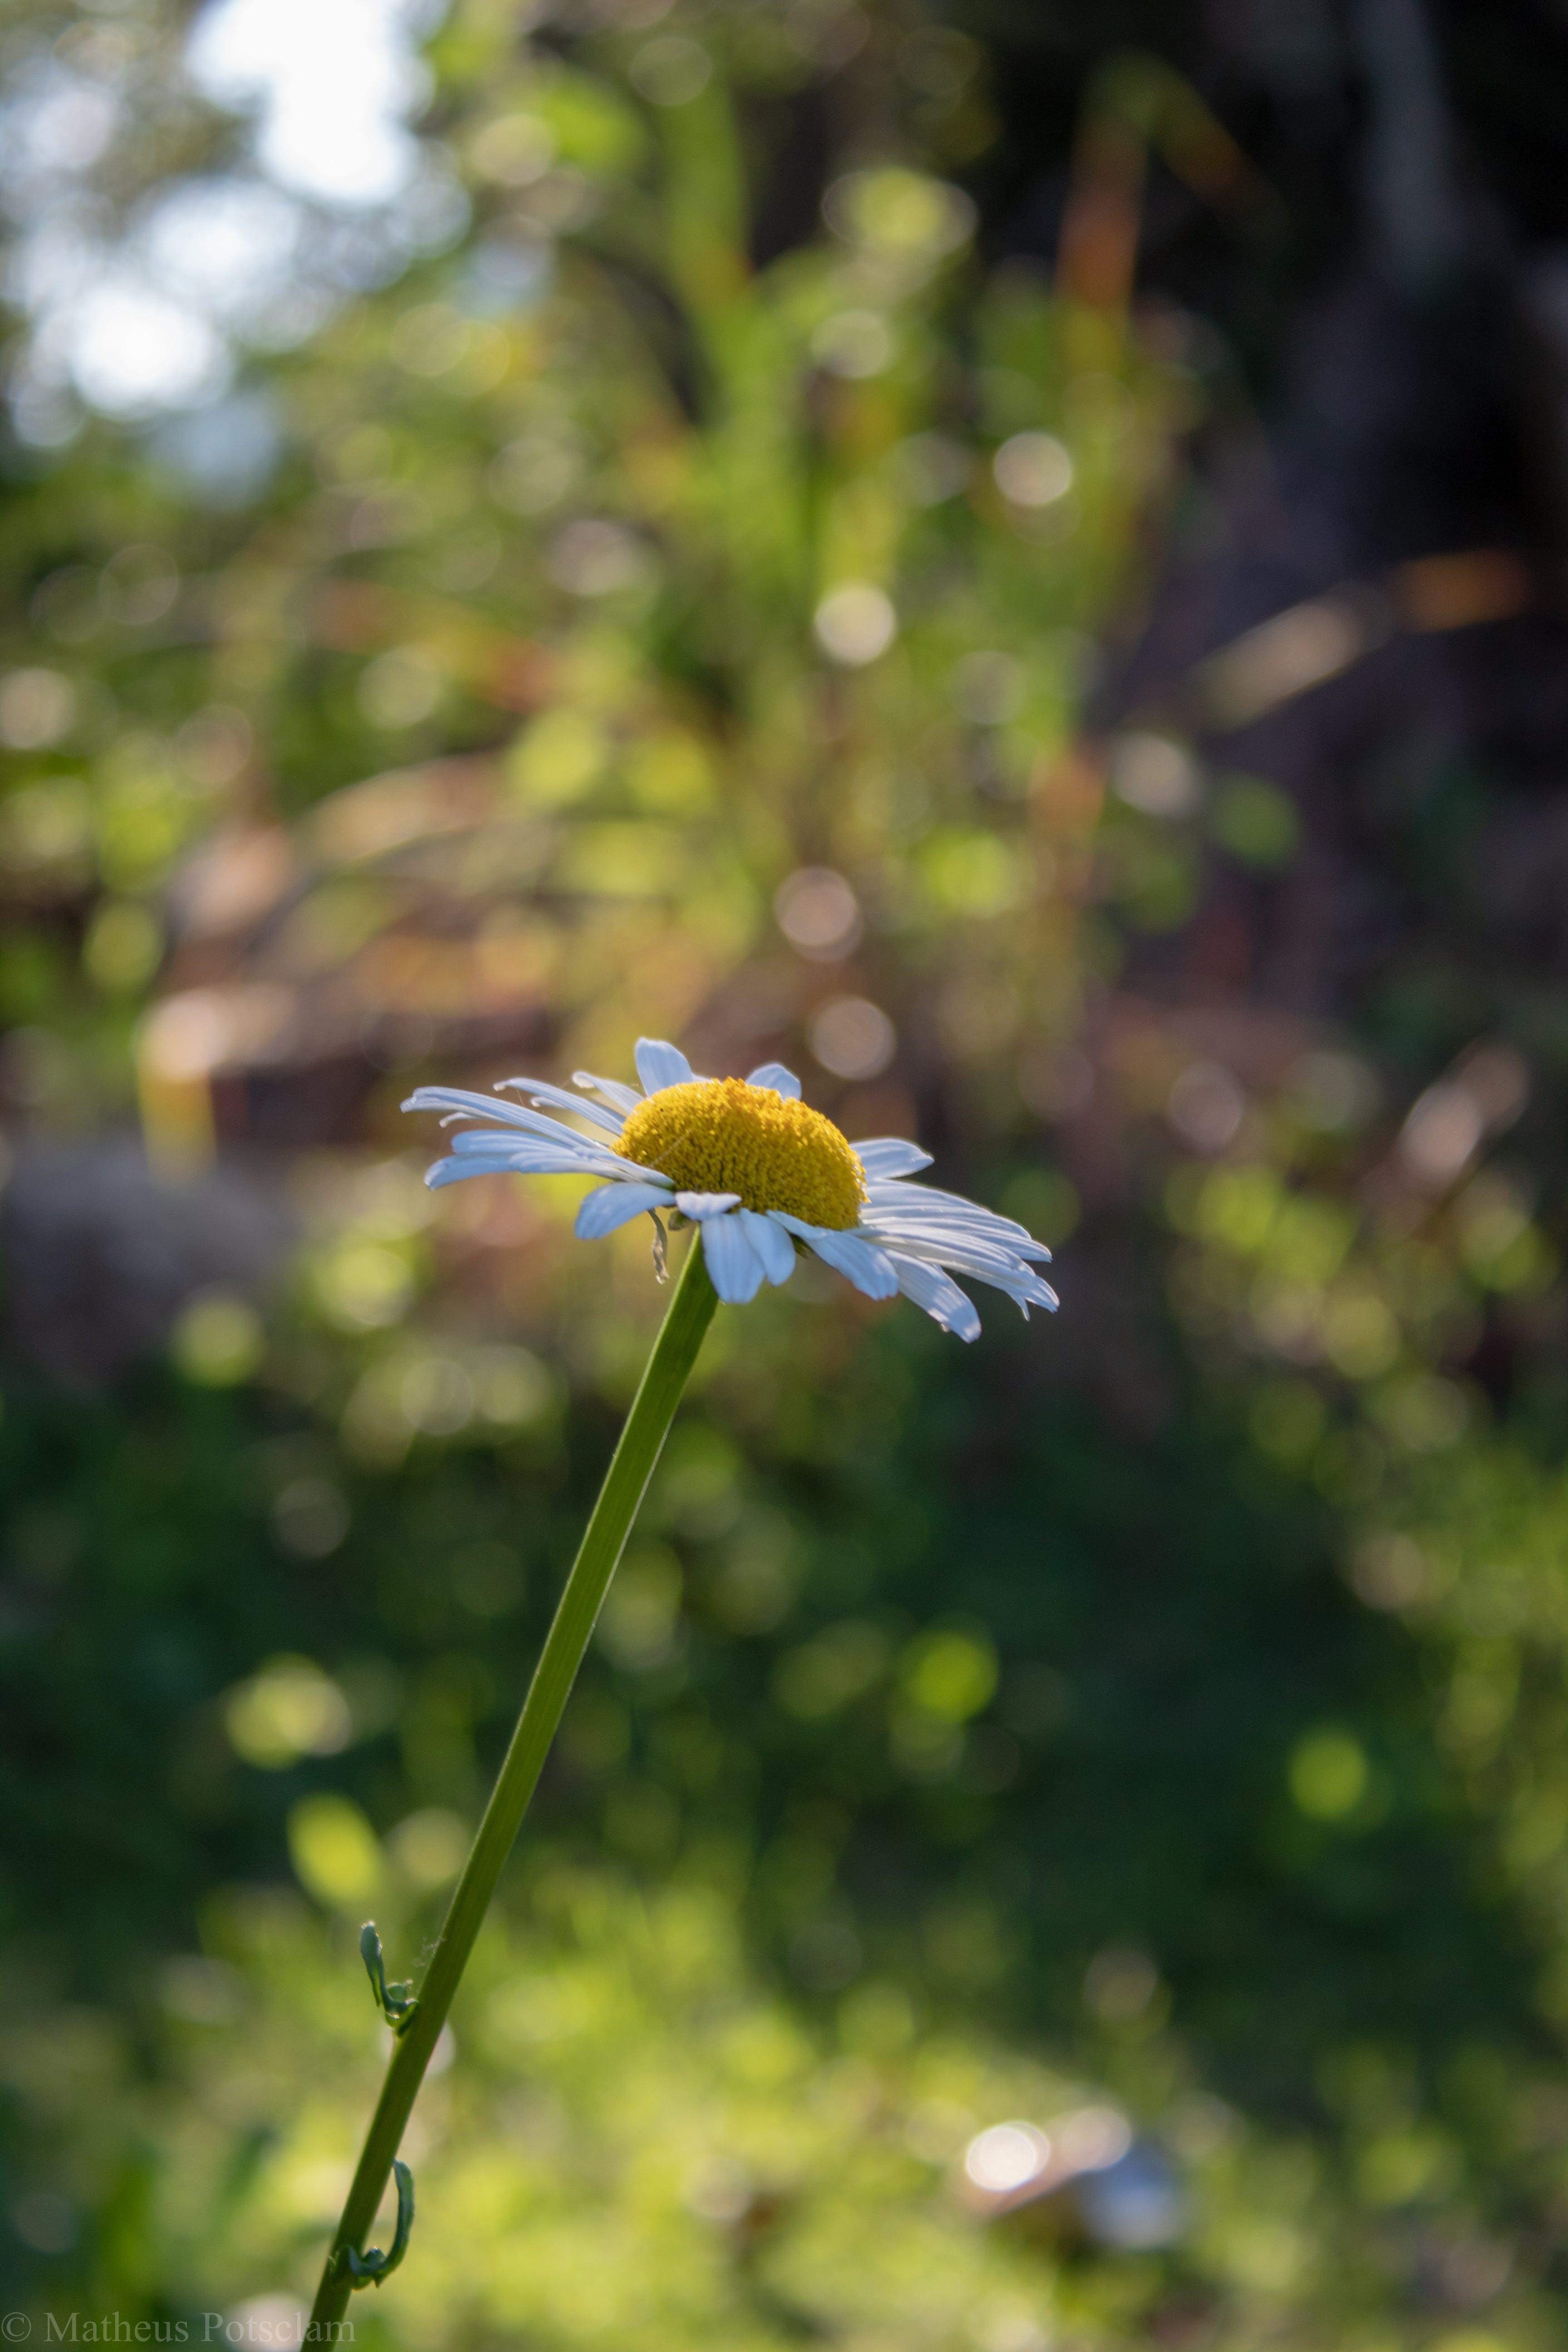 Free stock photo of afloramento, beleza na natureza, buquê de flores, flor